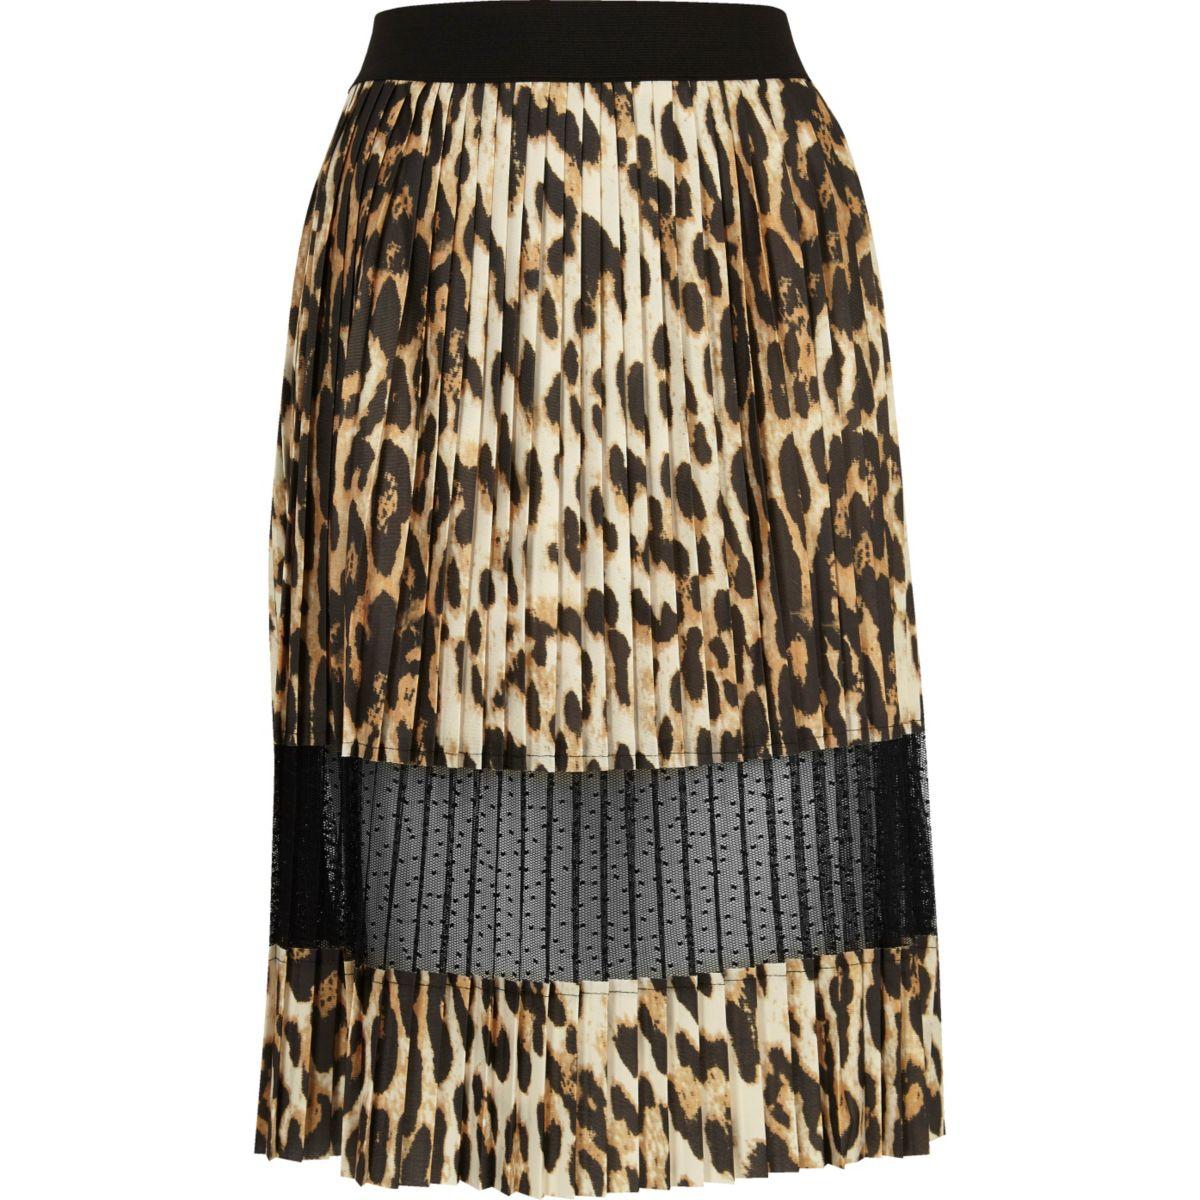 Brown leopard print lace panel midi skirt